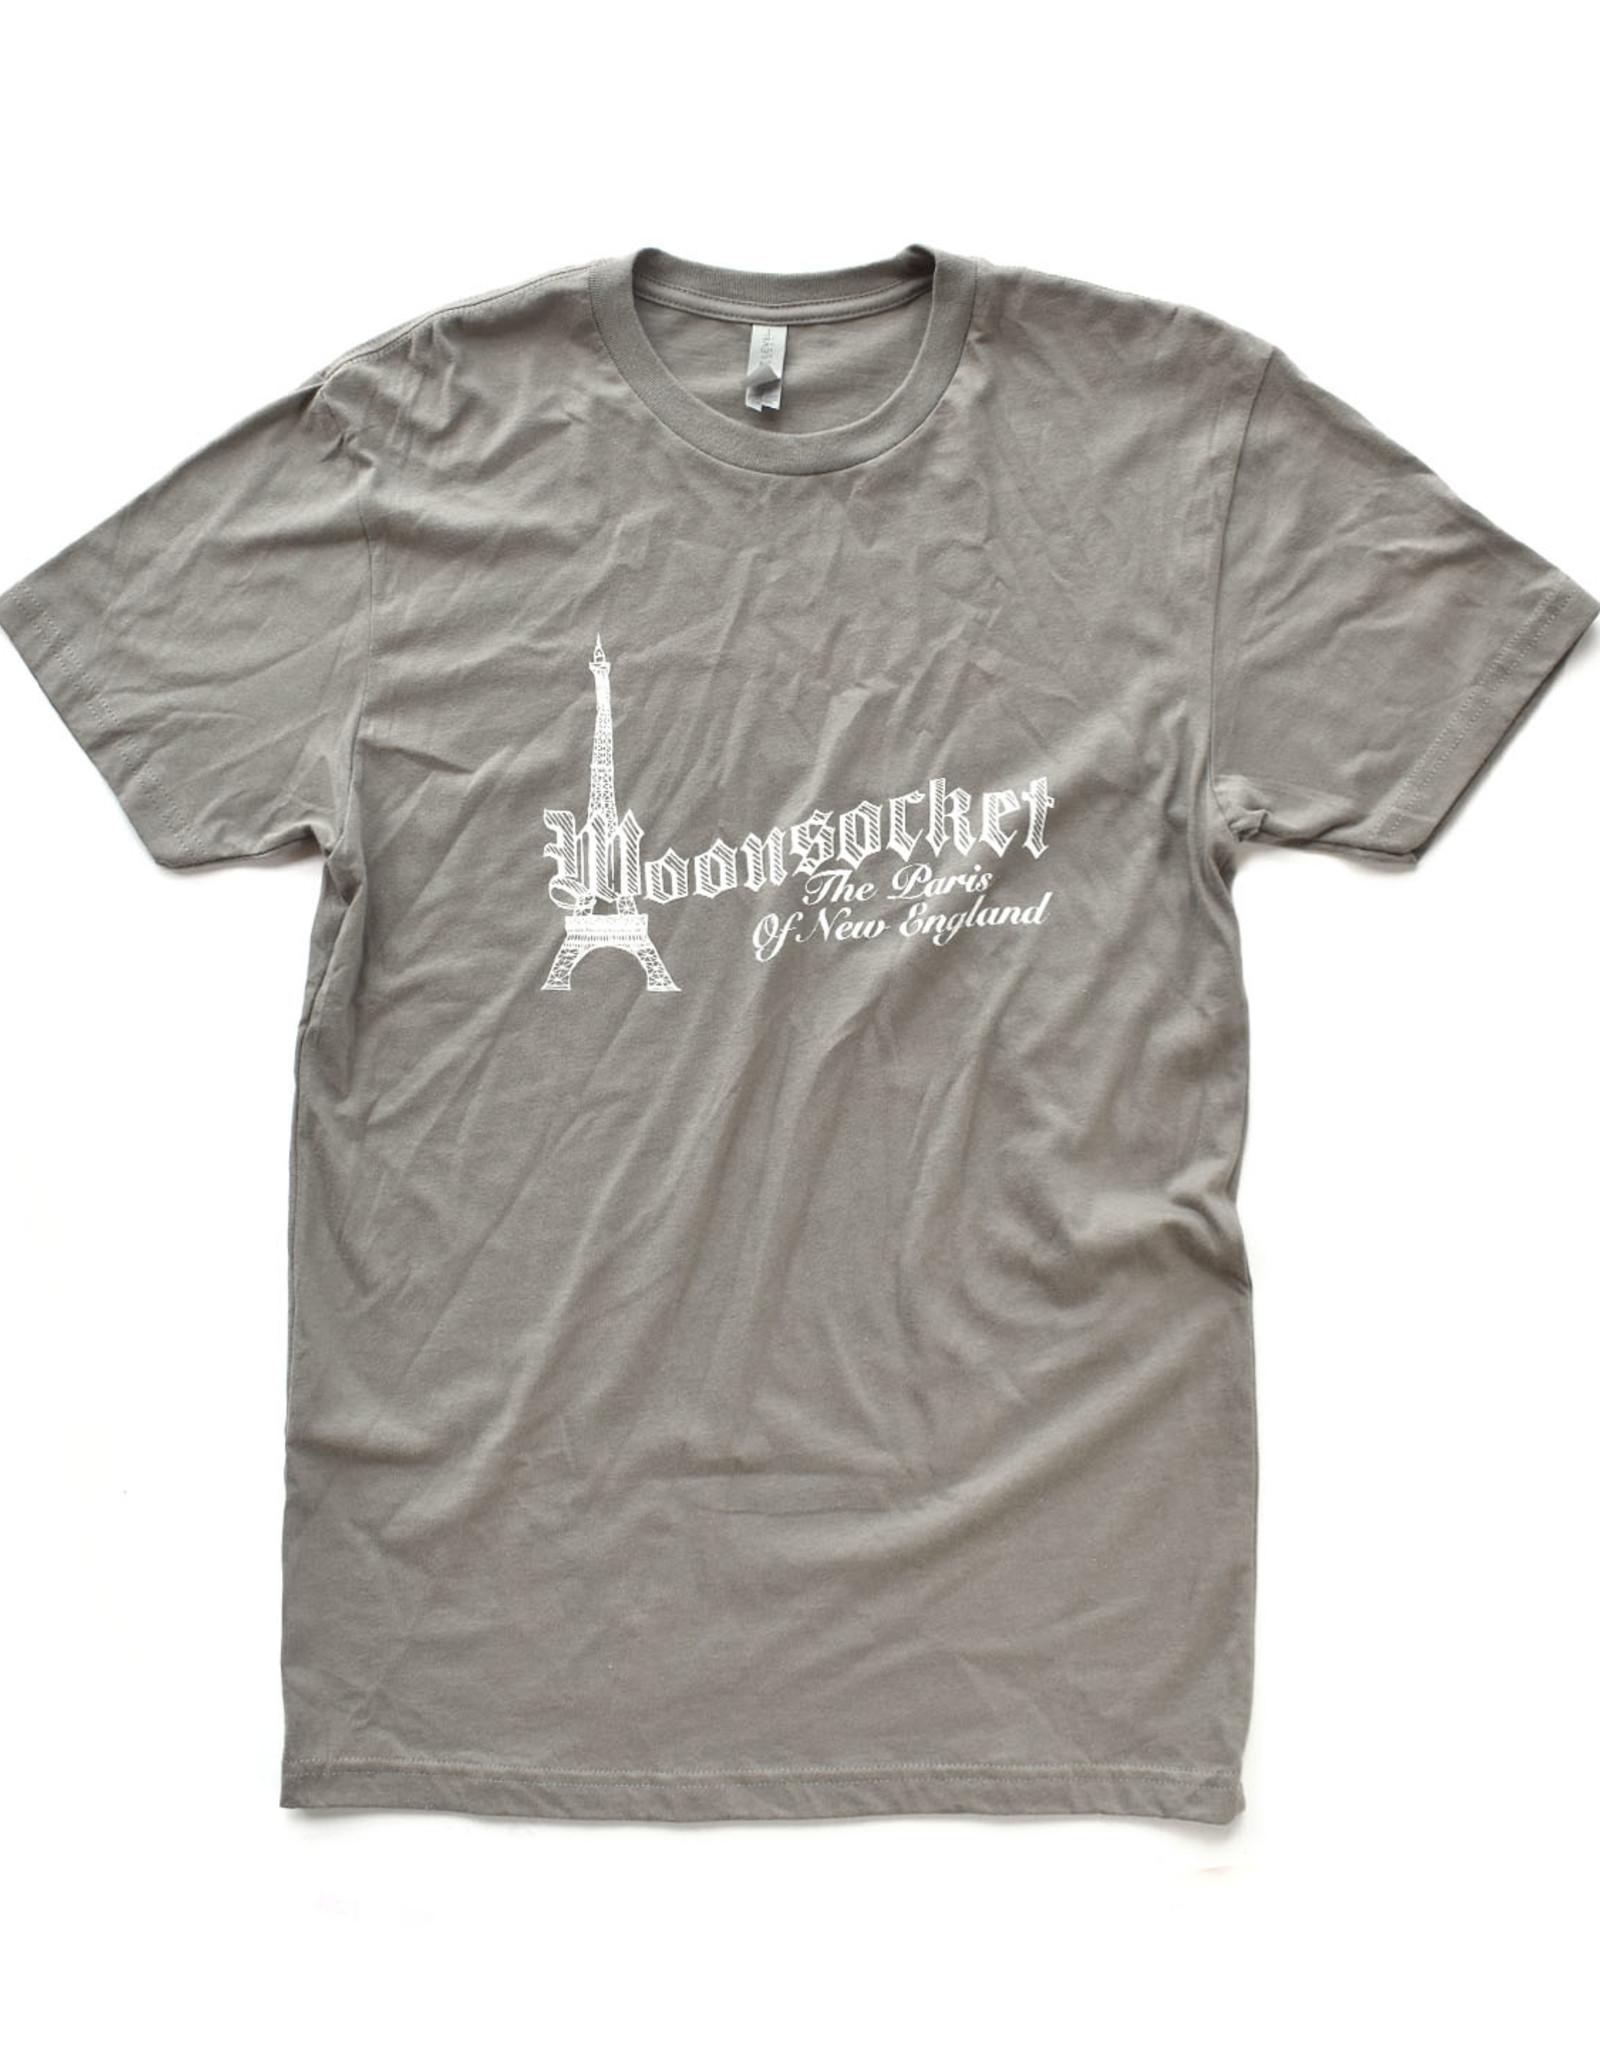 Woonsocket Paris T-Shirt